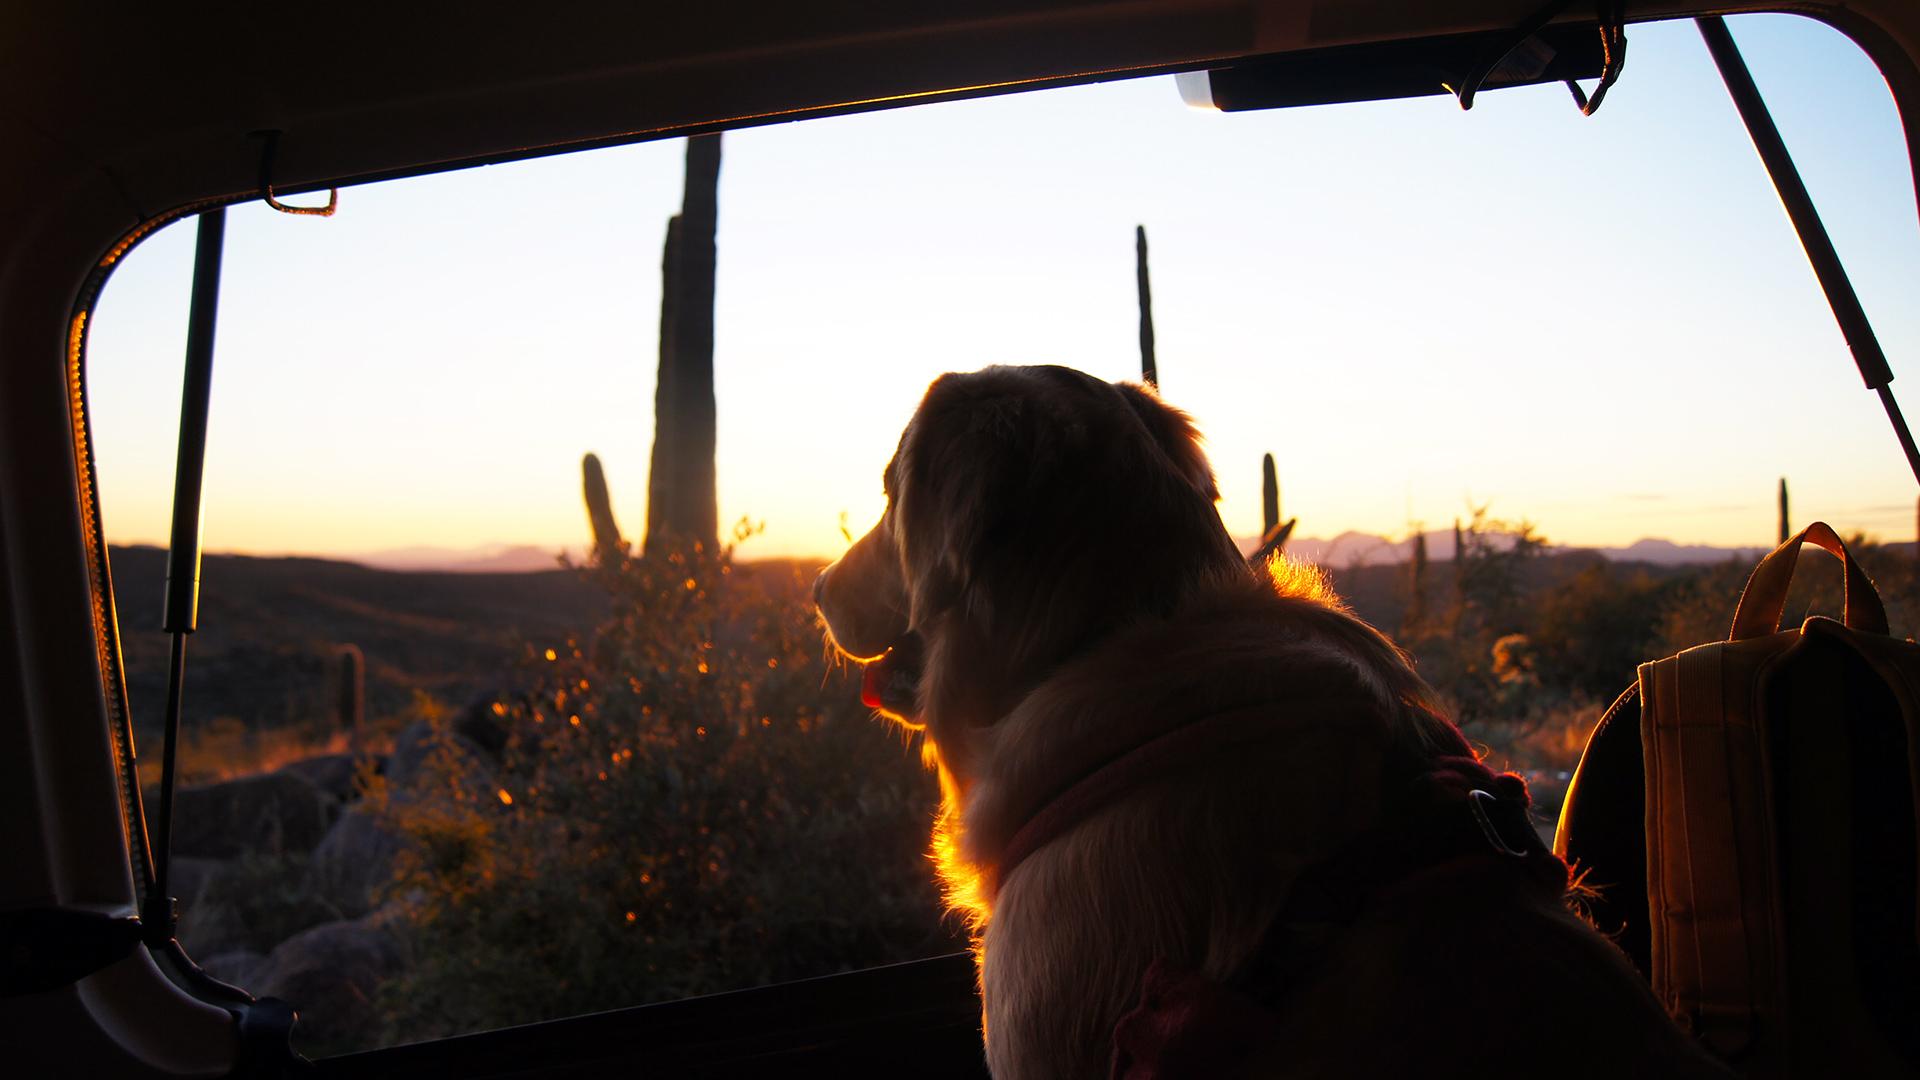 golden retriever arizona jeep sunset